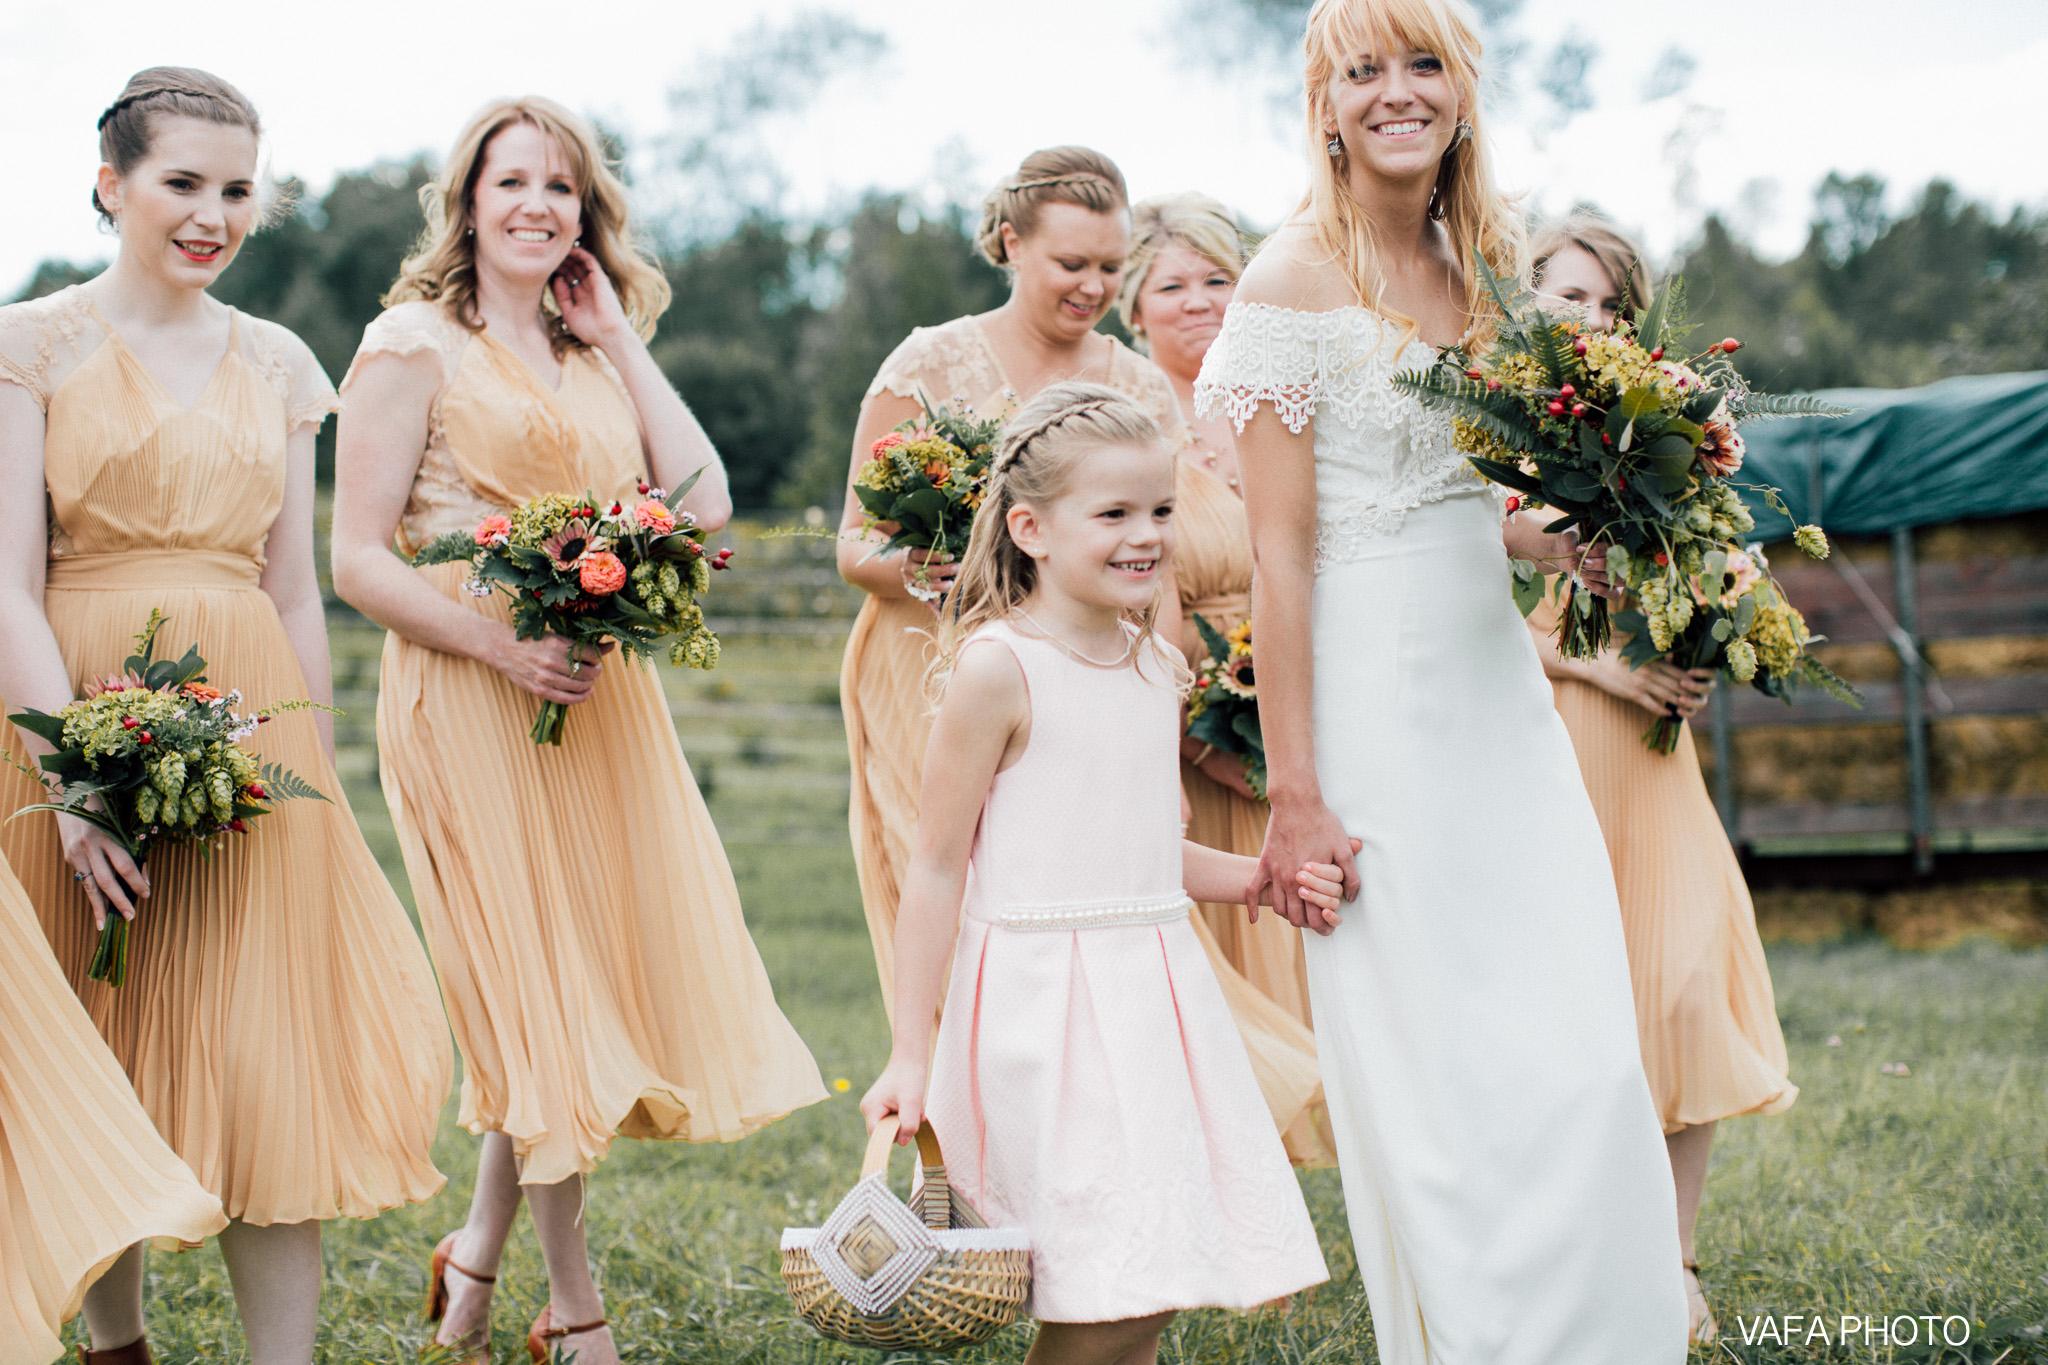 Belsolda-Farm-Wedding-Christy-Eric-Vafa-Photo-278.jpg